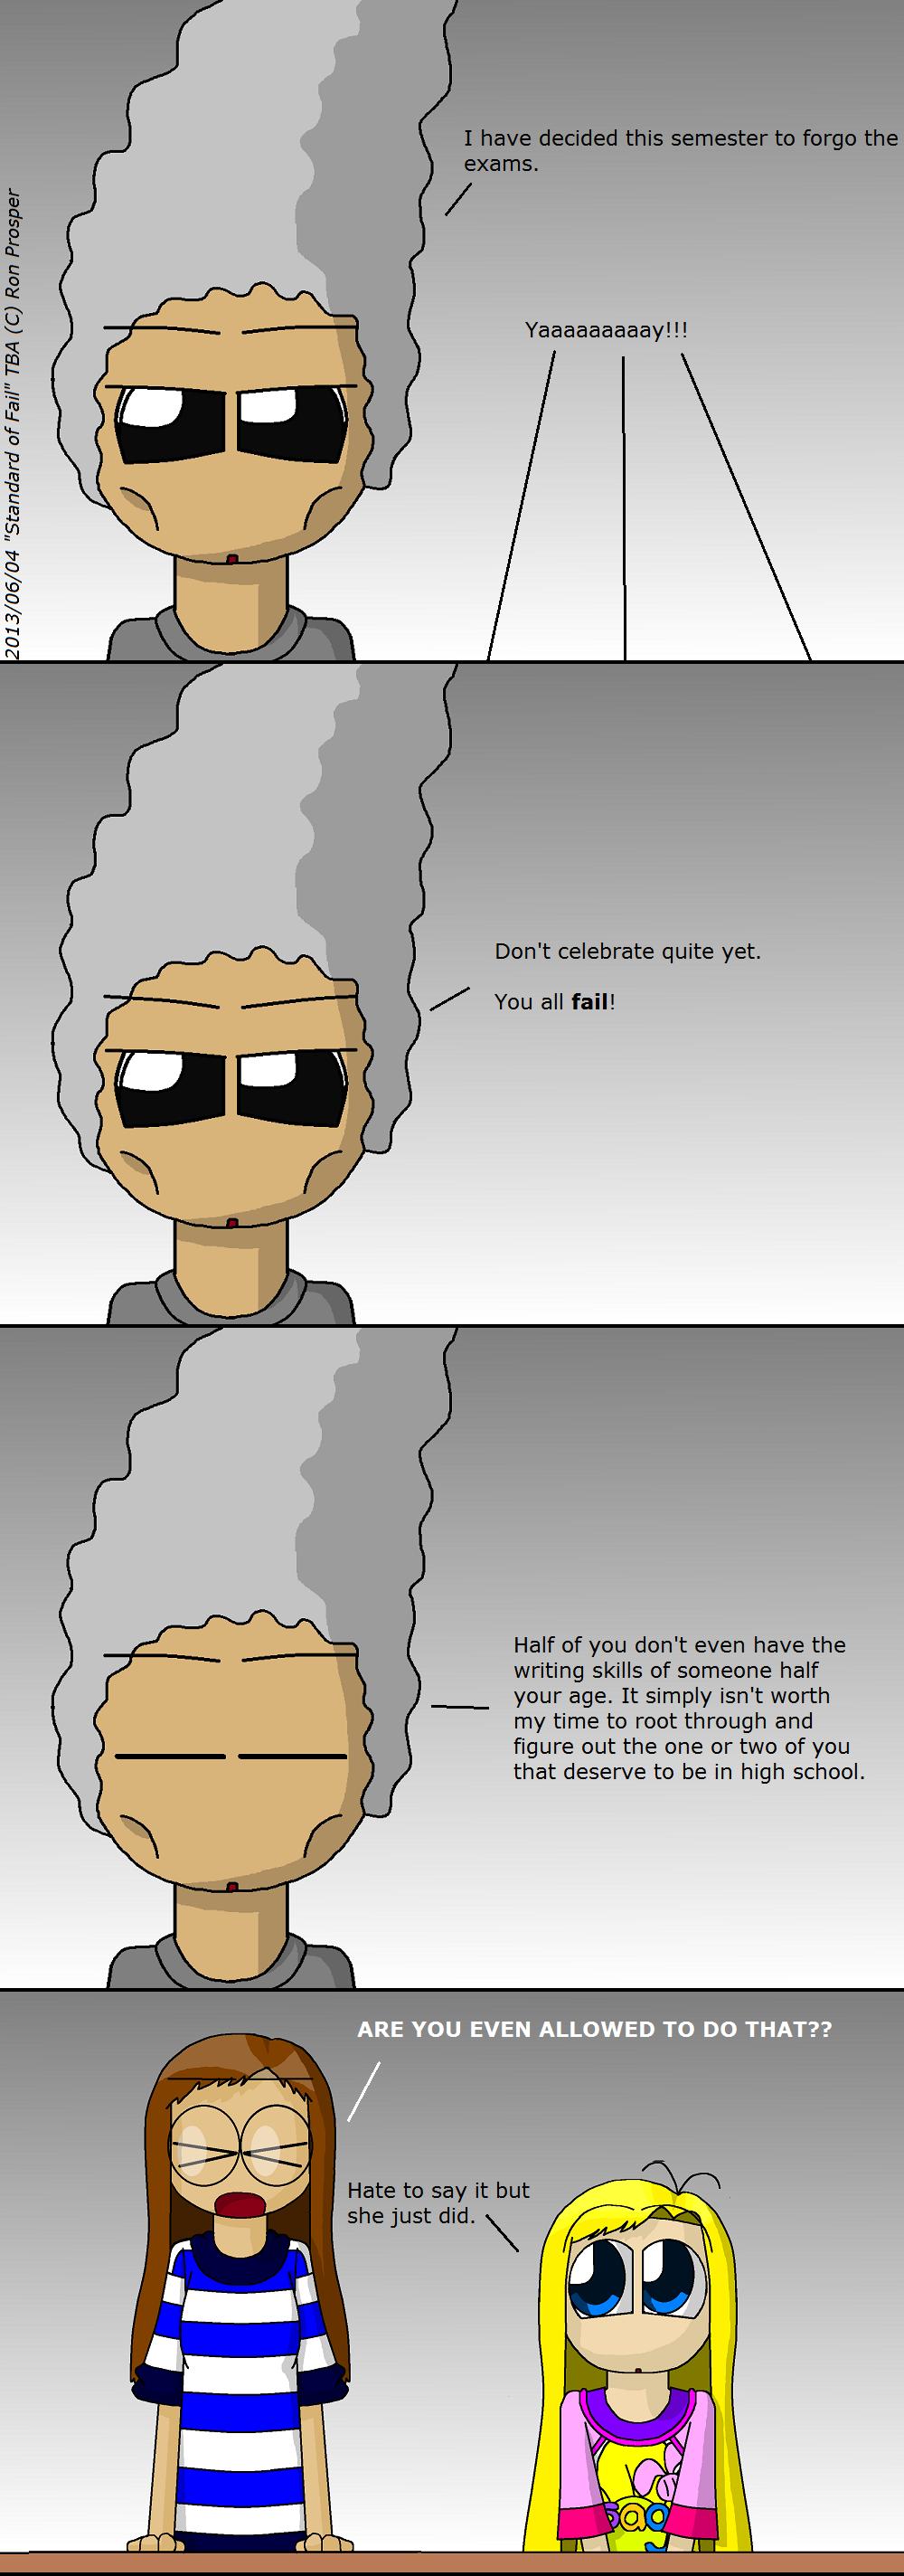 Standard of Fail (6/4/13)